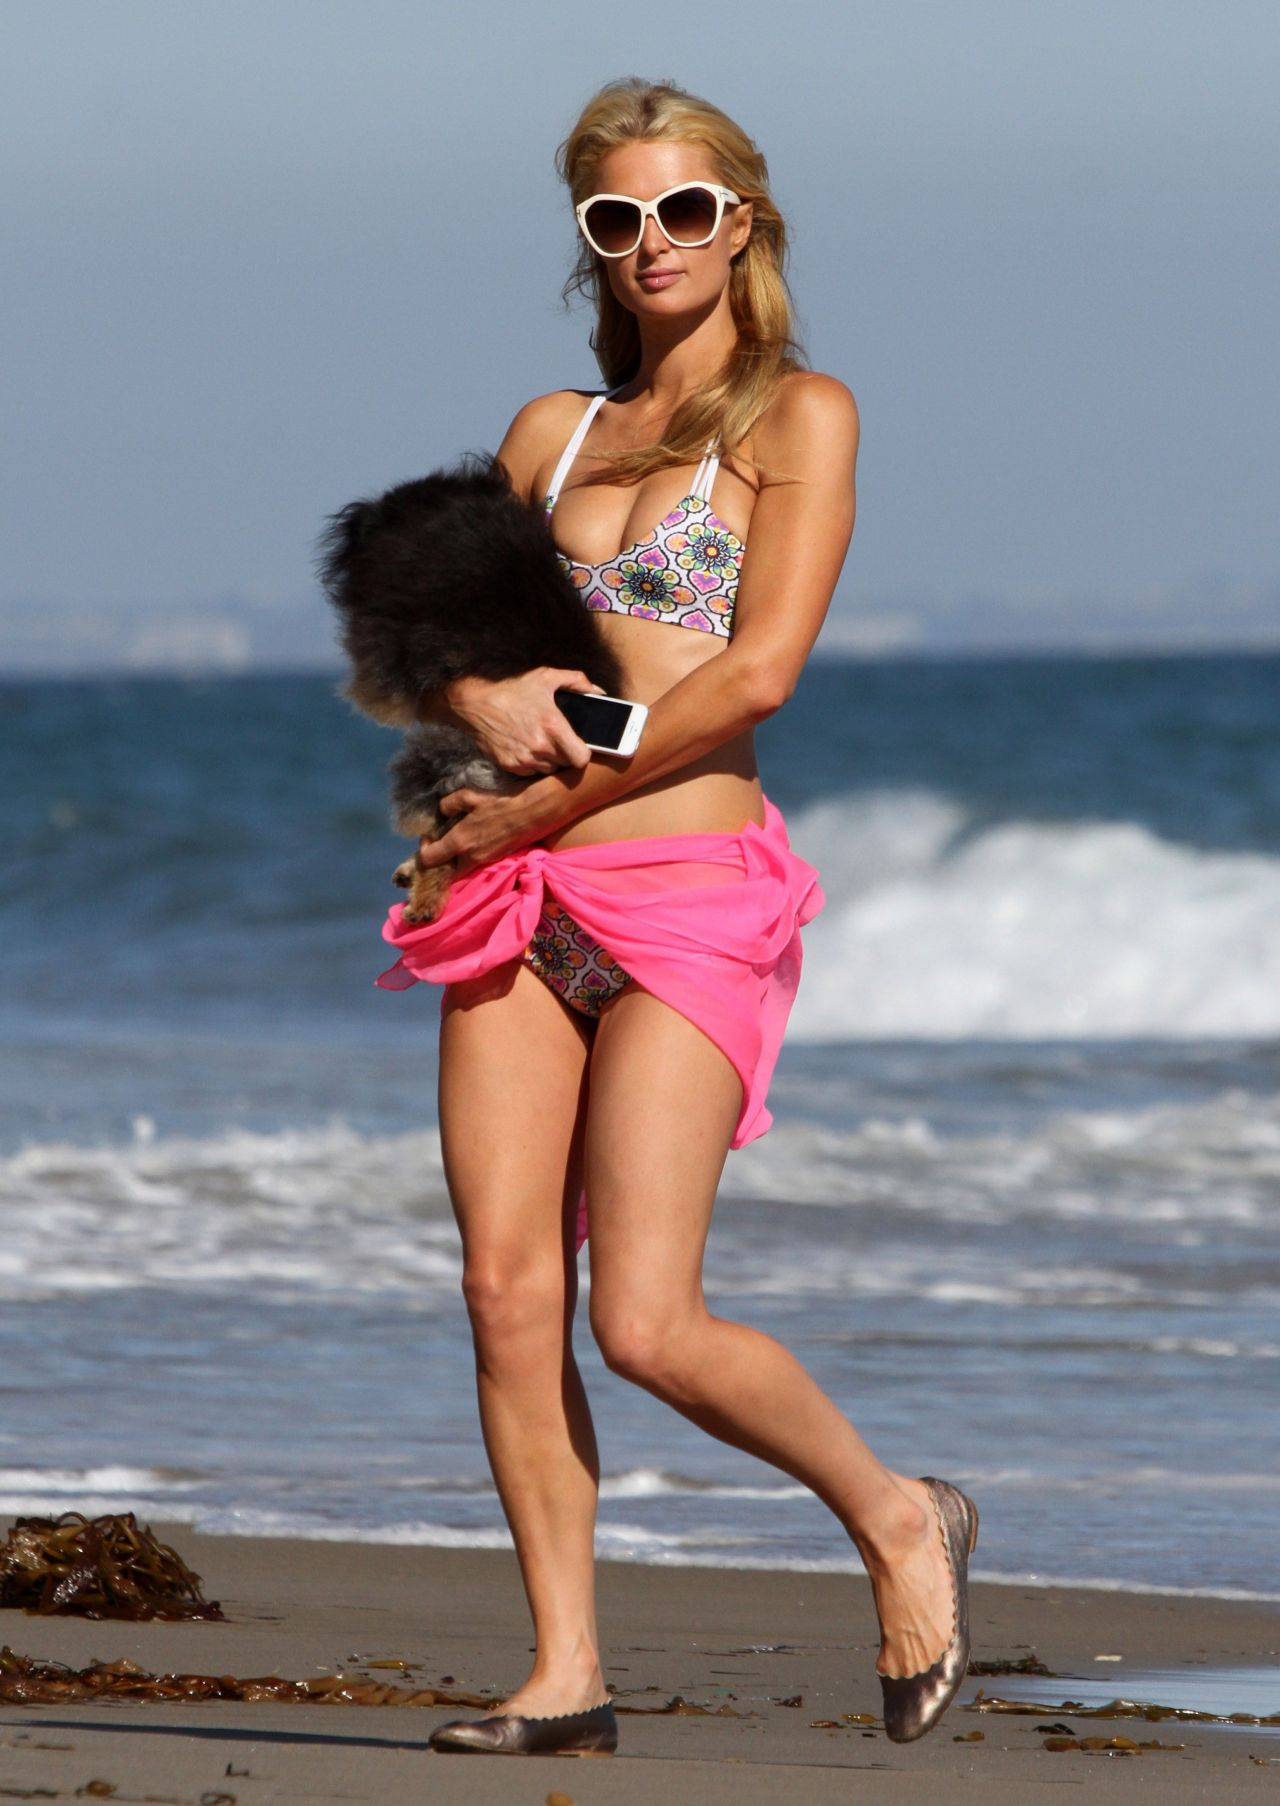 Paris Hilton Wearing A Bikini In Malibu July 2014